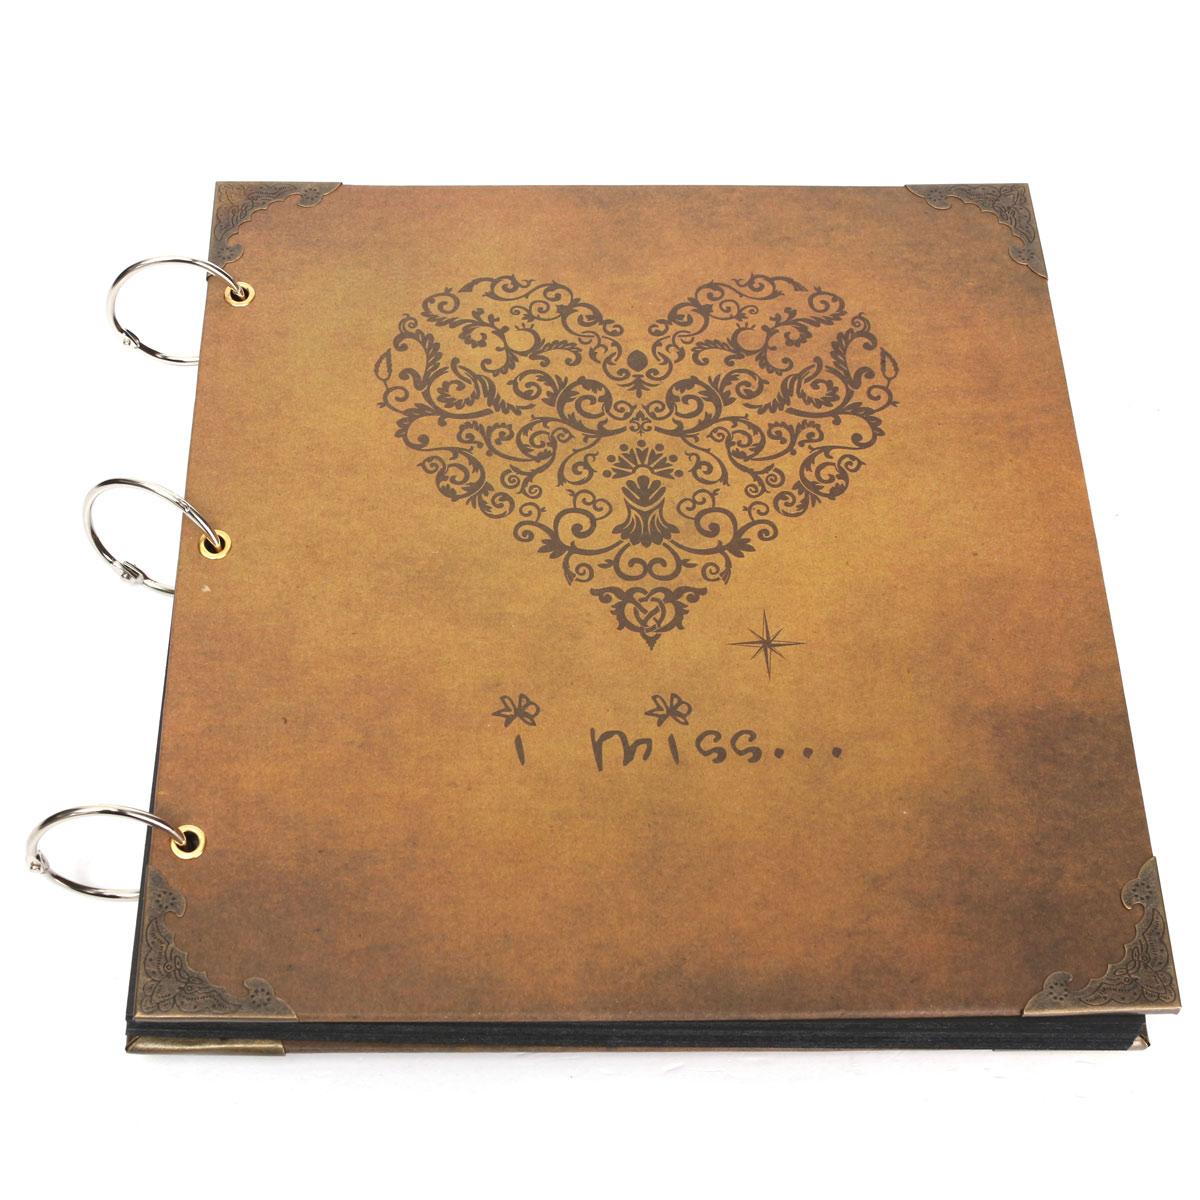 How to scrapbook wedding album - New Heart Type Loose Leaf Wedding Kraft Album Diy Photo Albums Family Photos Scrapbook Diary